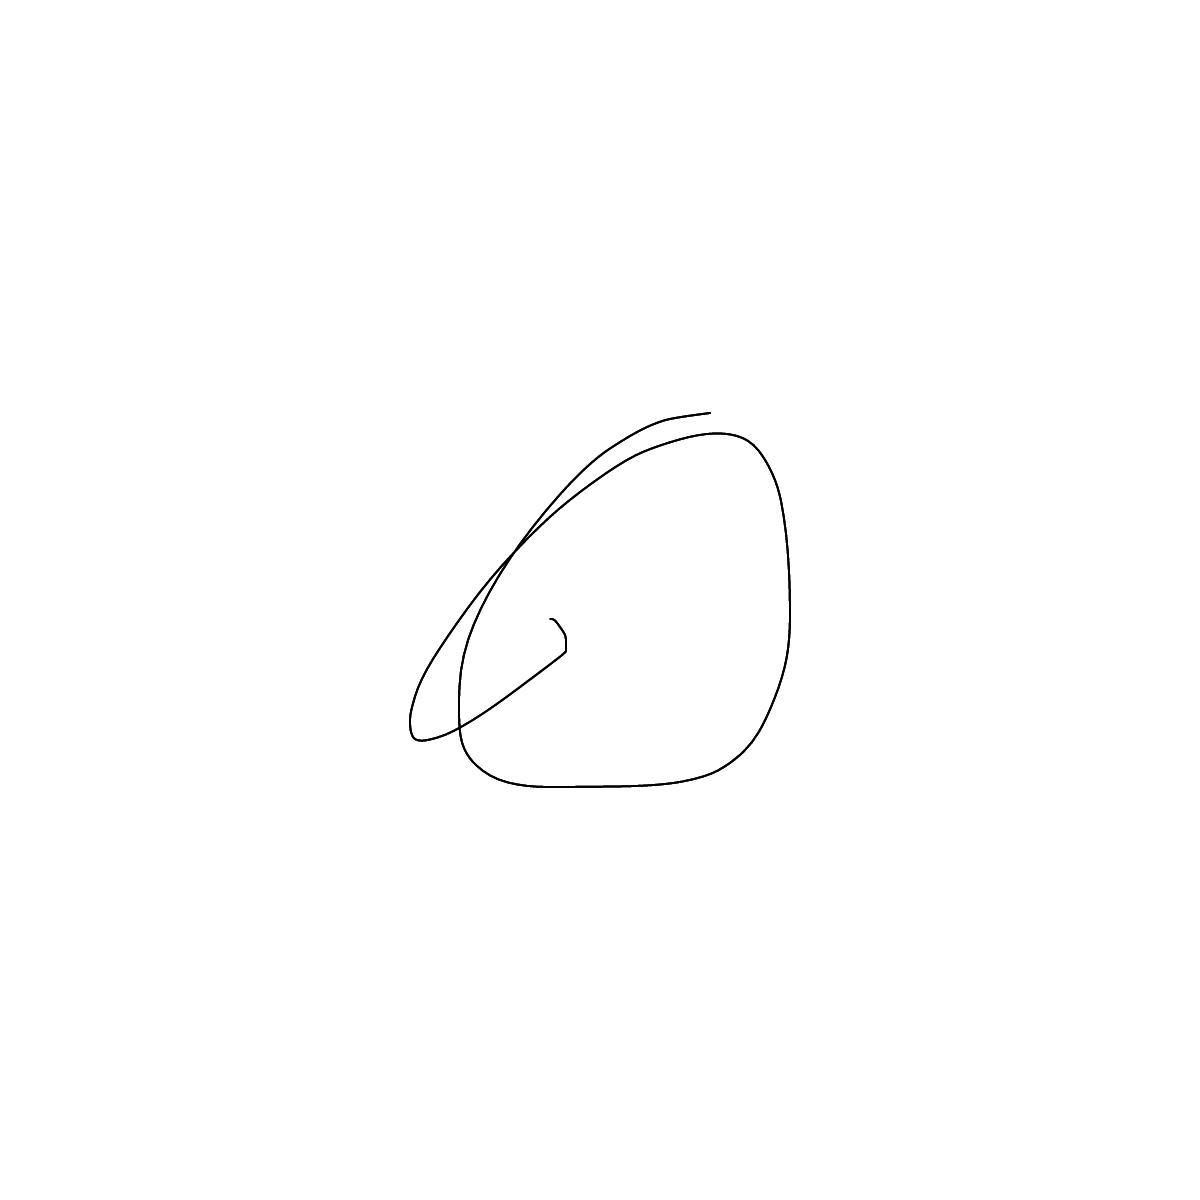 BAAAM drawing#7990 lat:51.7972221374511700lng: -59.3133850097656250